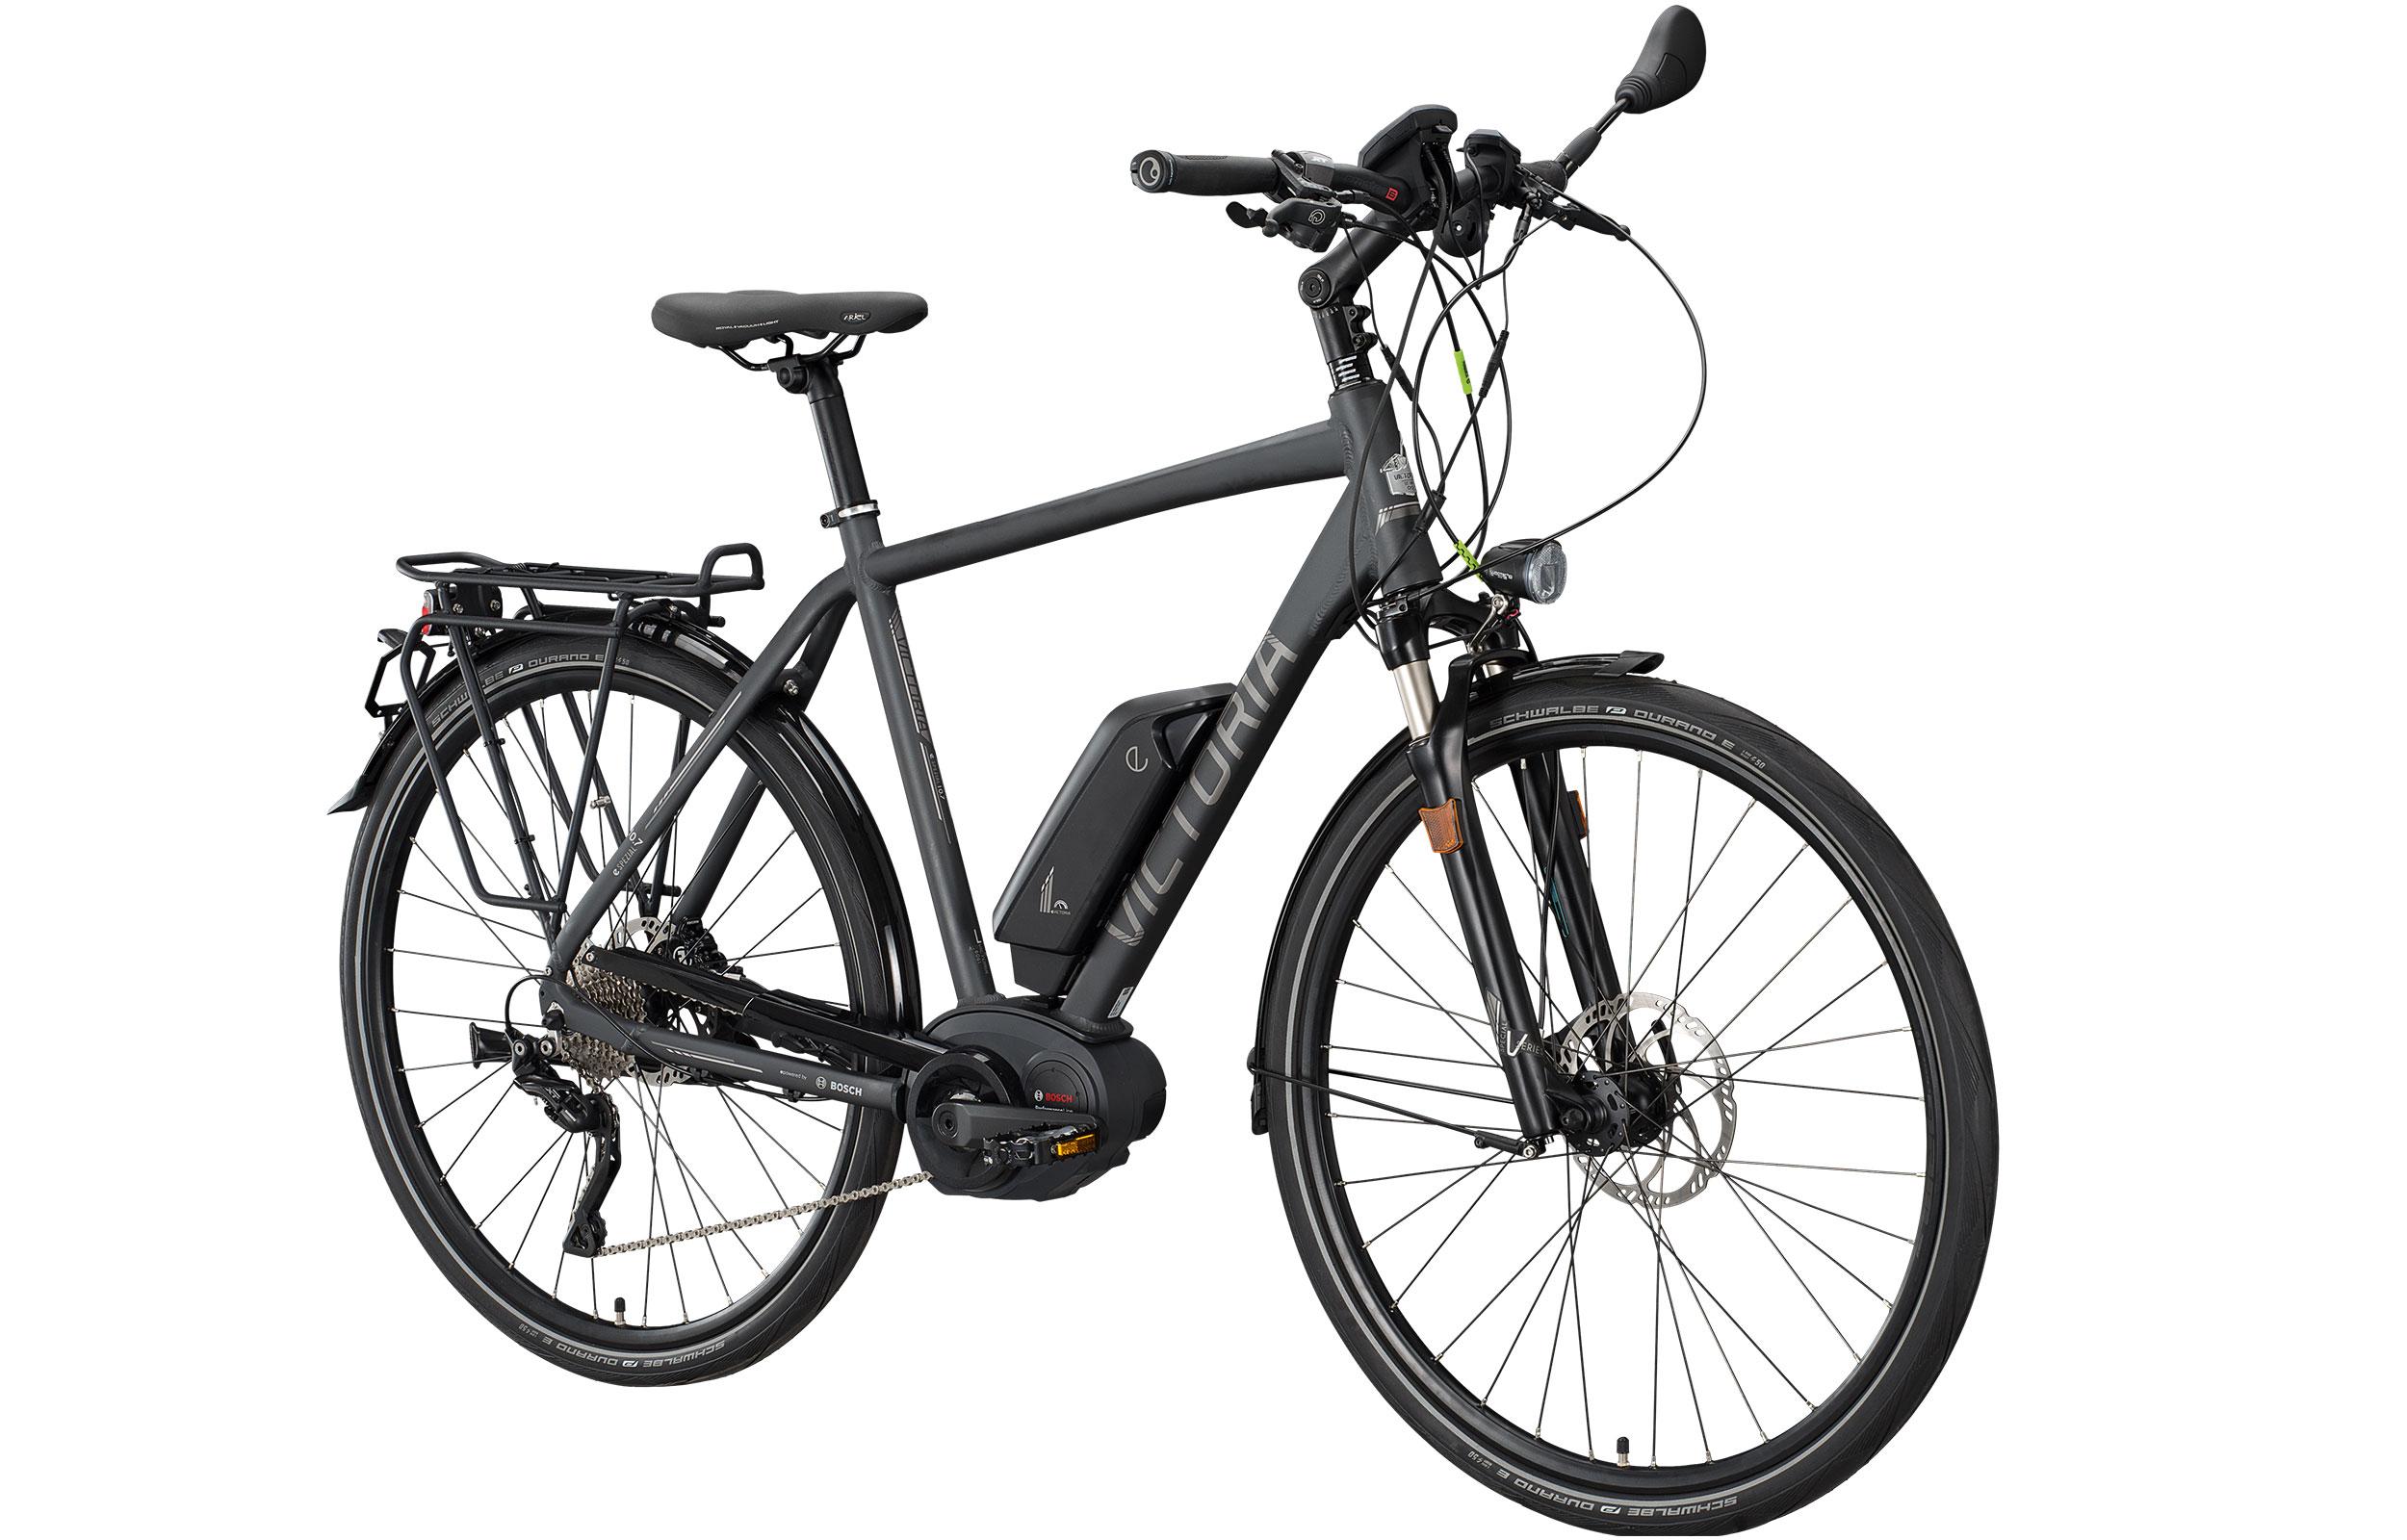 victoria 10 7 e bike speedbike 45km deore xt modelj 2018. Black Bedroom Furniture Sets. Home Design Ideas